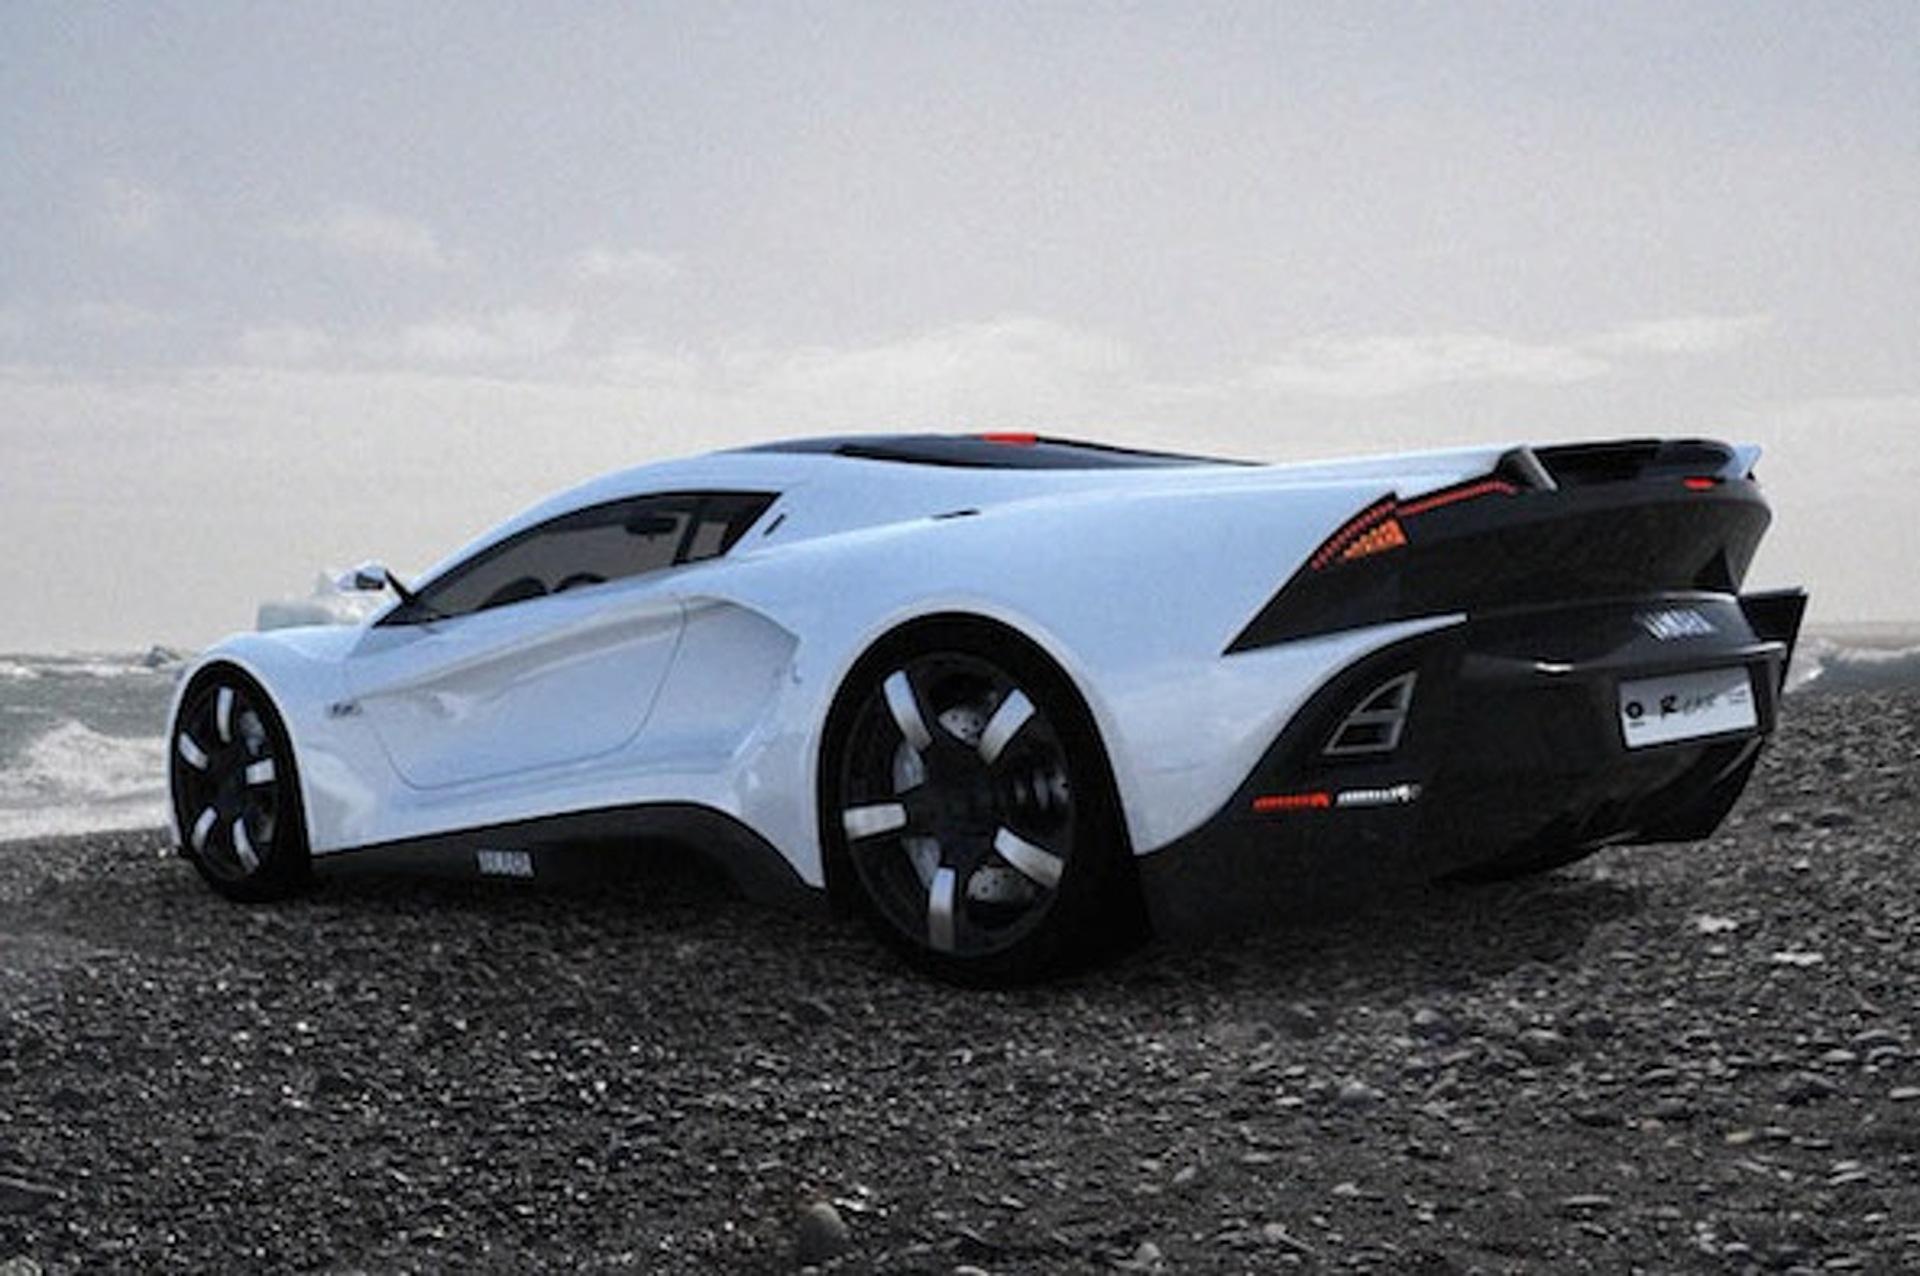 Yamaha Planning EV-based Sportscar?